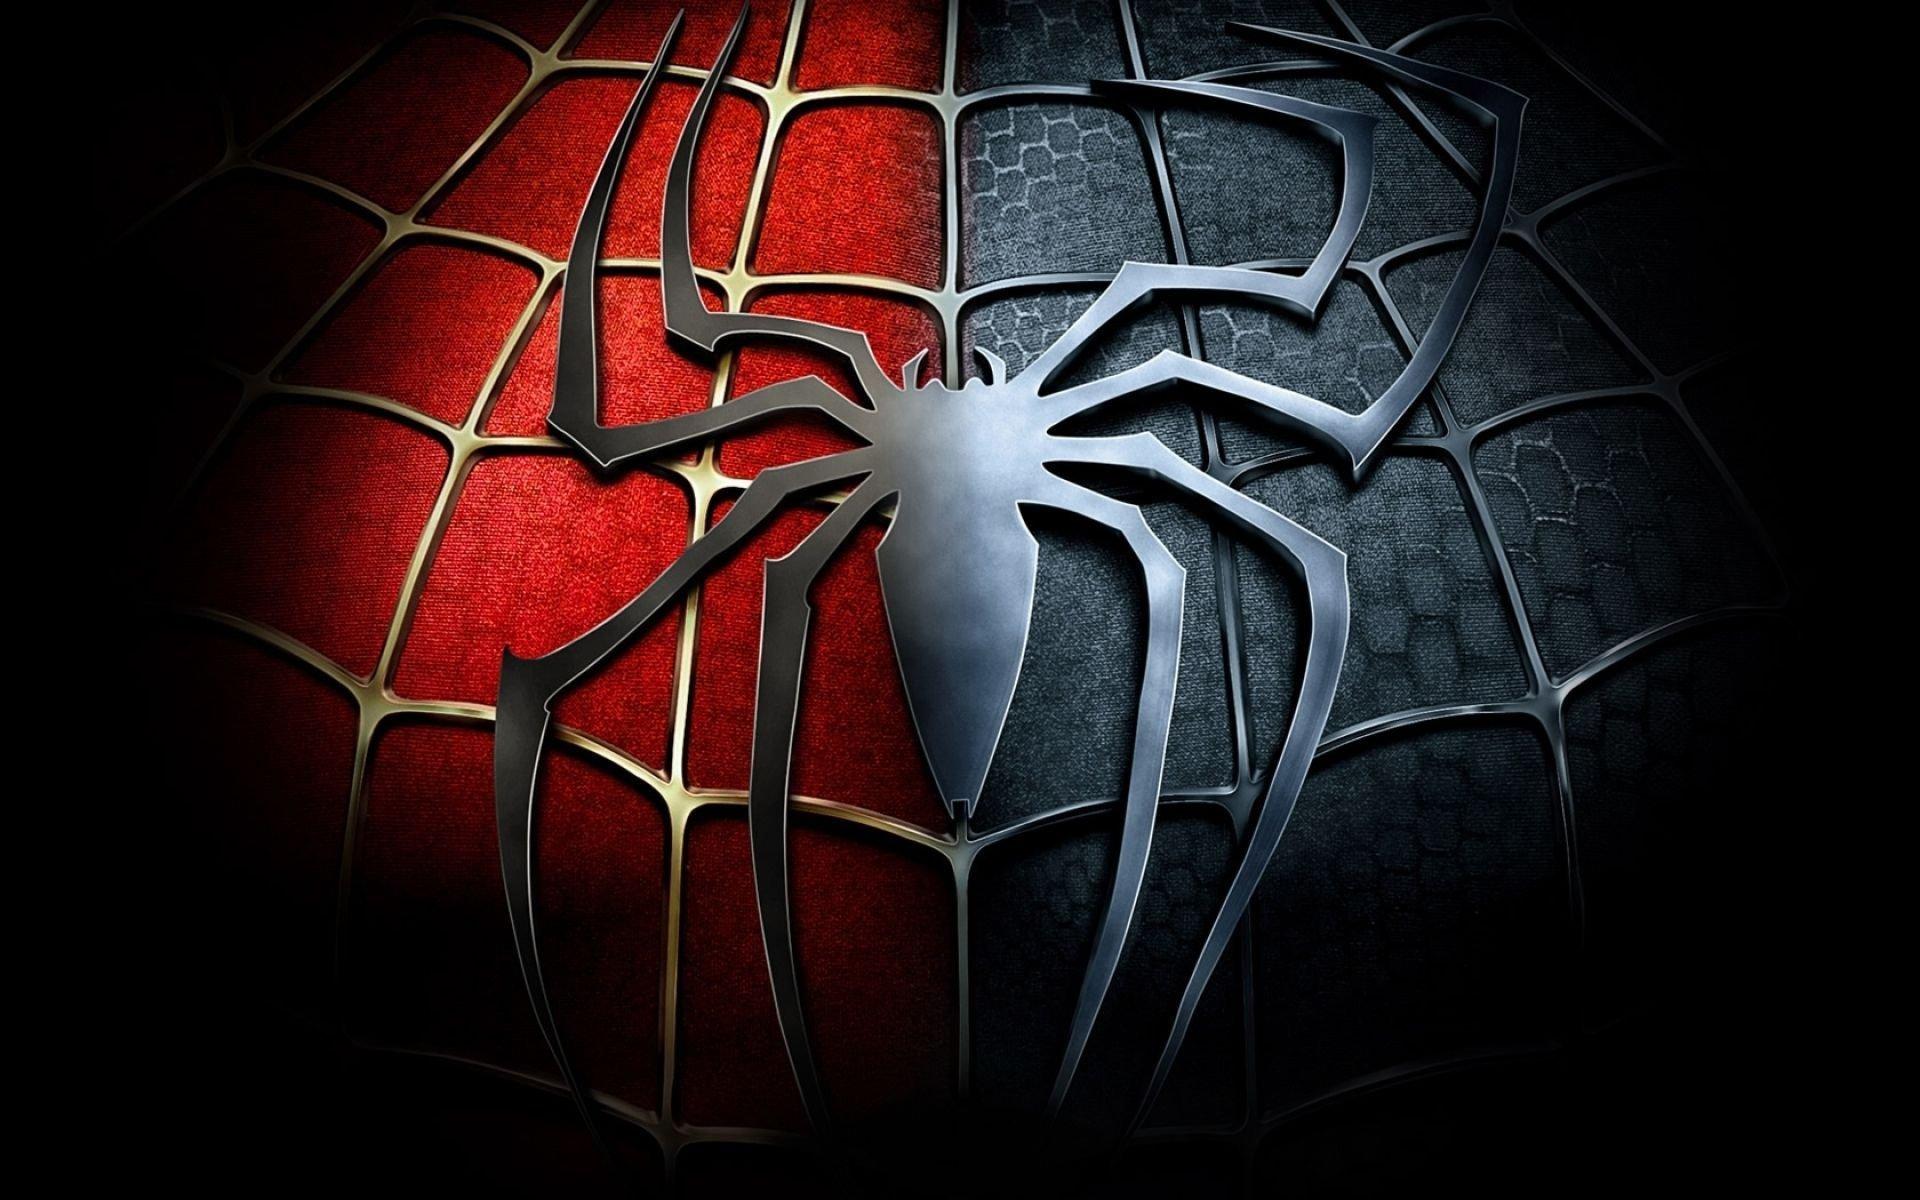 Spider Man 3 Wallpapers Hd For Desktop Backgrounds